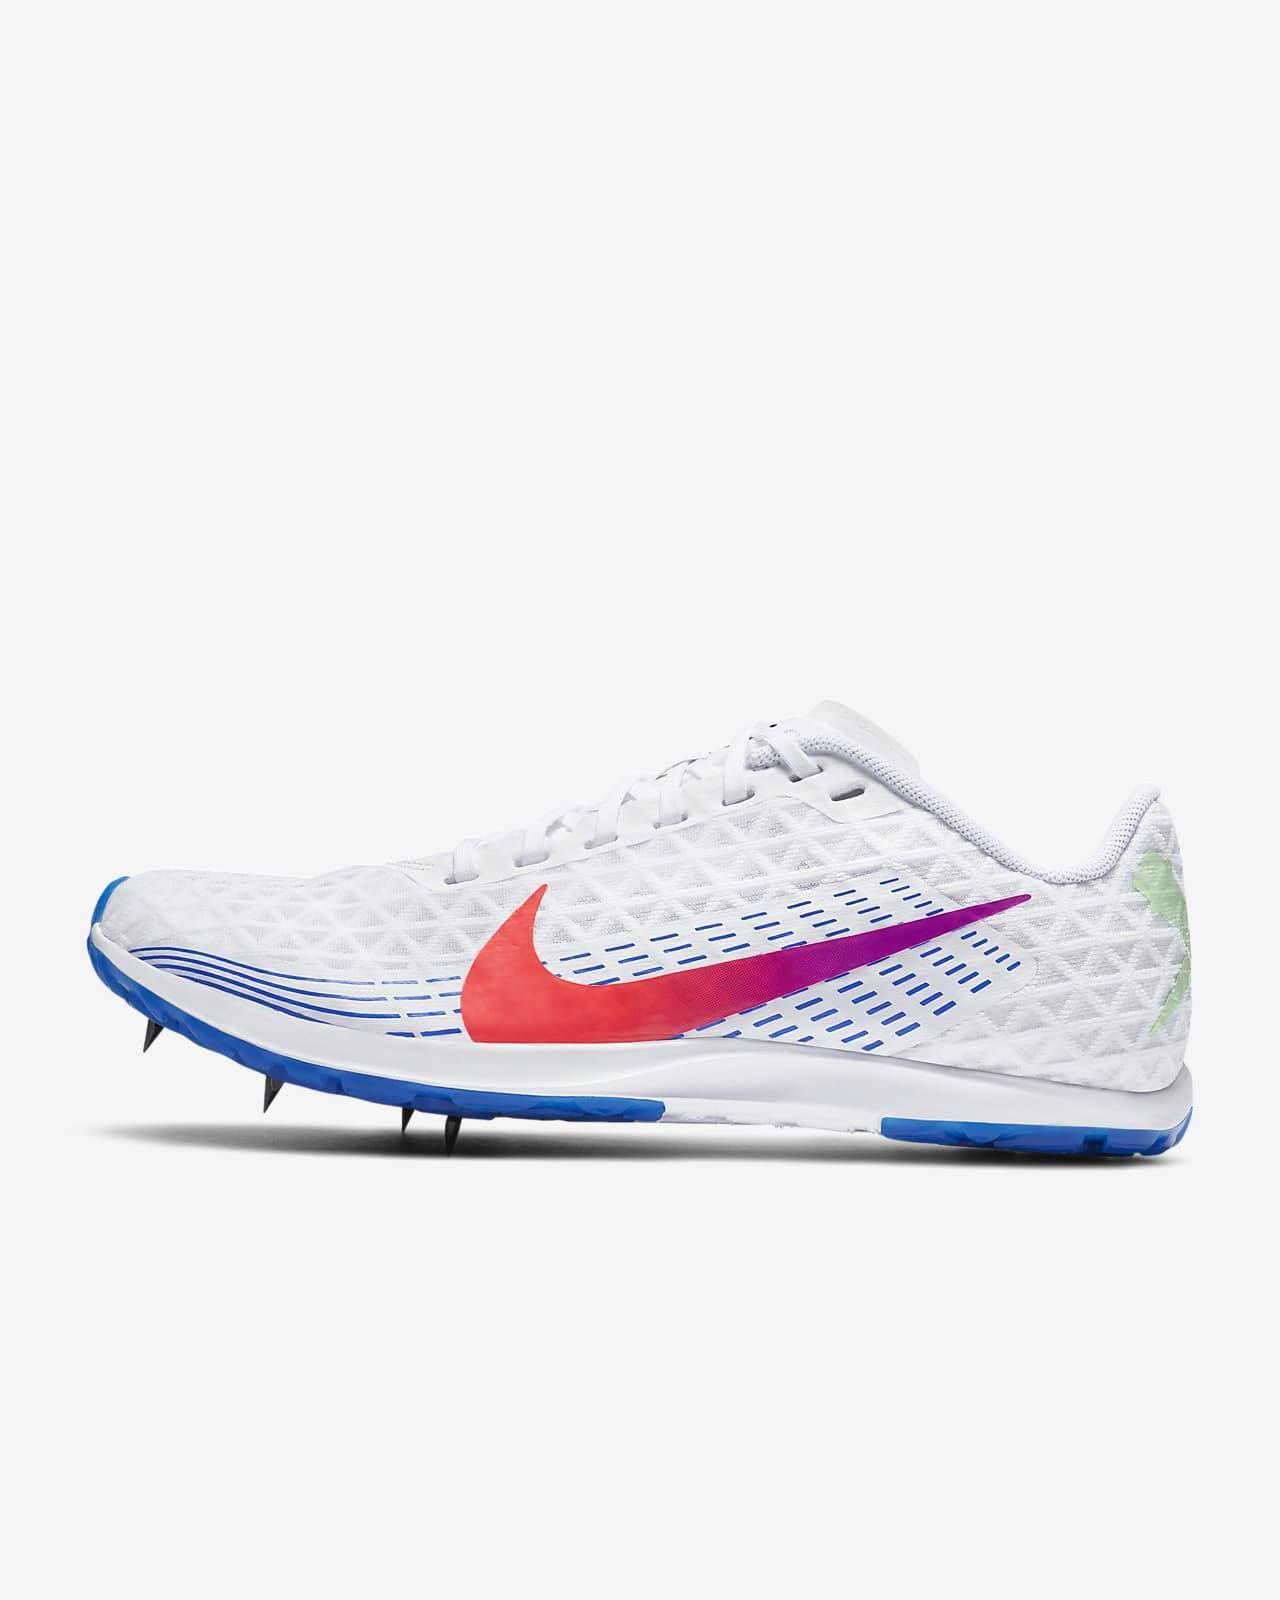 Inclinado Fortaleza repentino  Sapatilhas de pista Nike Zoom Rival XC para mulher. Nike PT